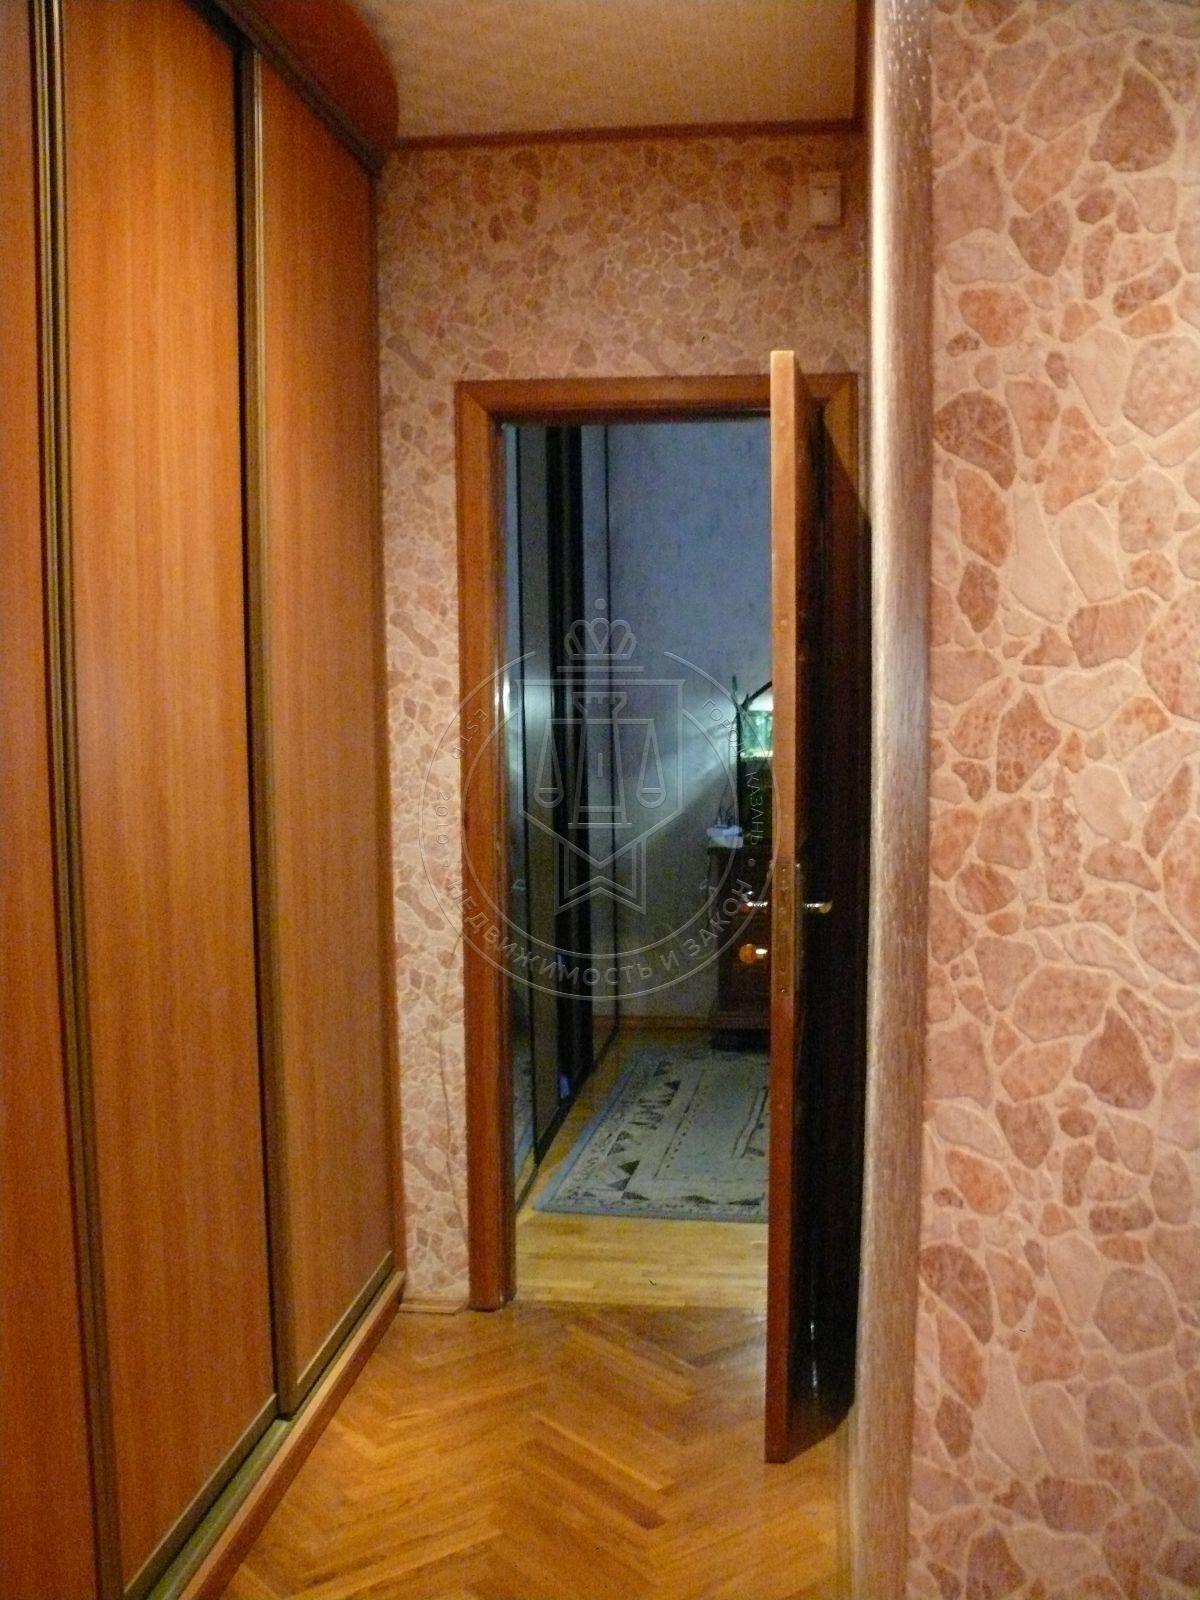 4-к квартира, 122 м², 7/9 эт., Зорге 88 (миниатюра №3)